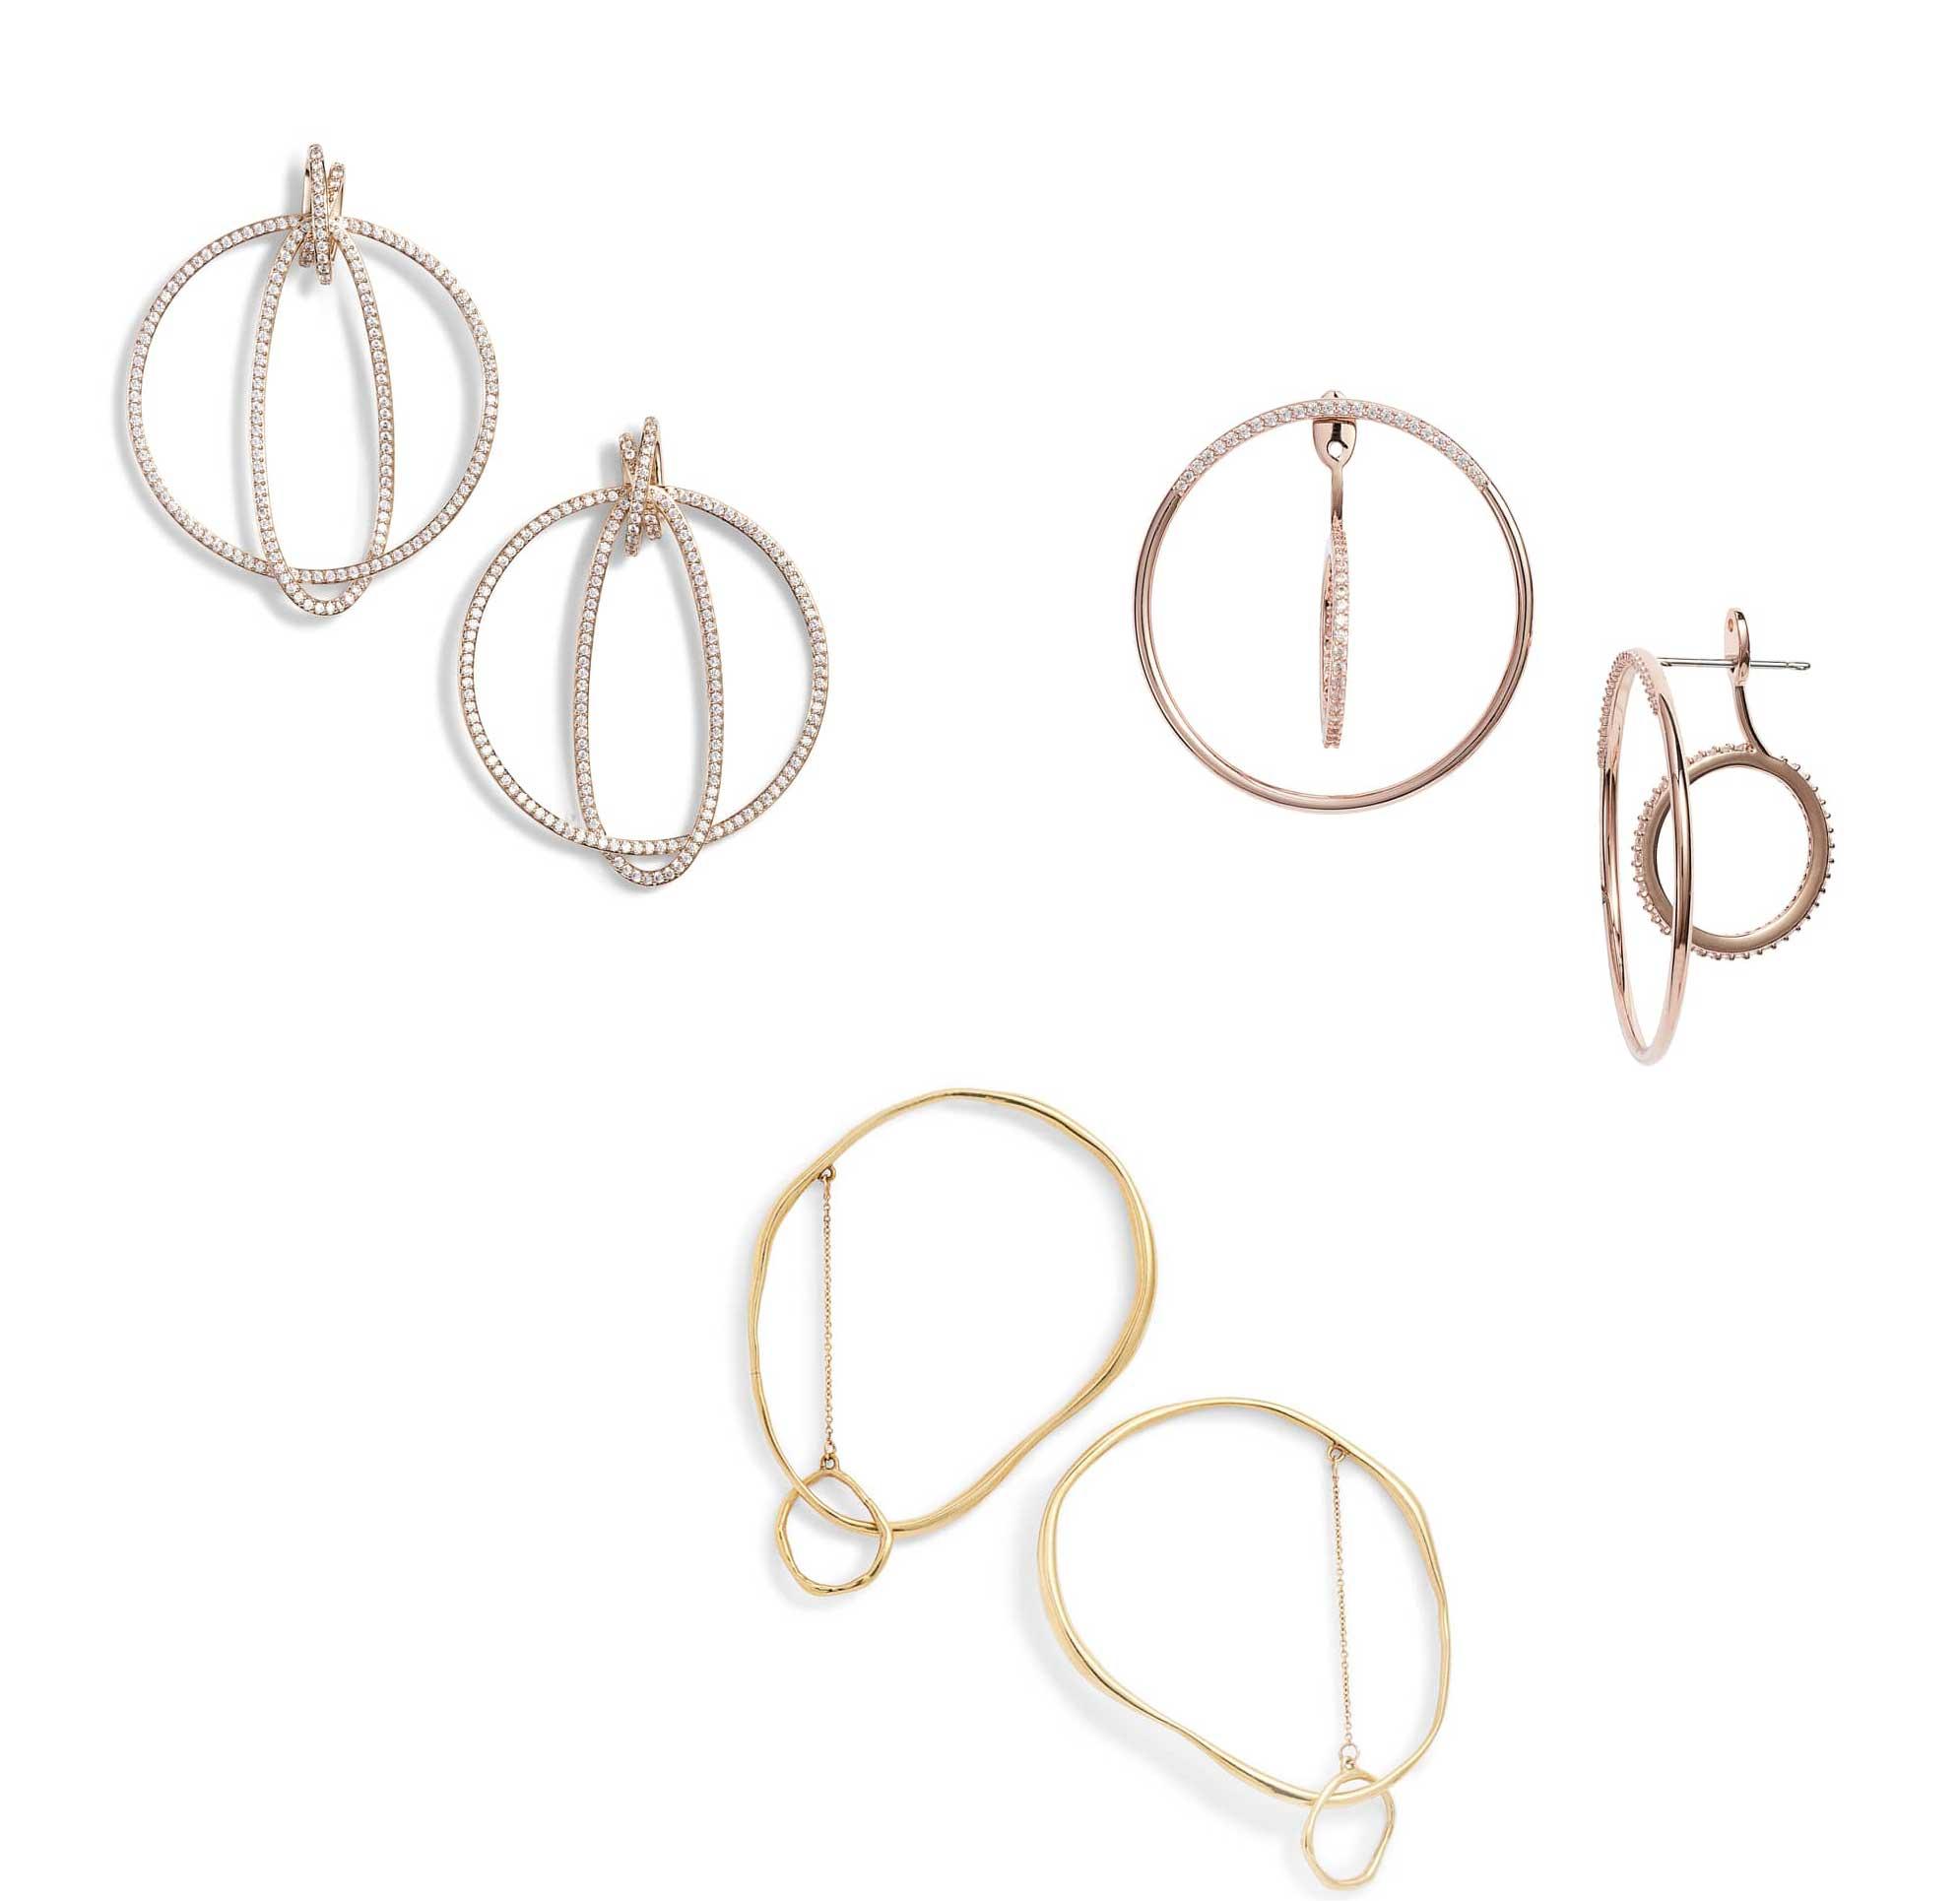 Jute Orbiting Earrings, Intersecting Hoop Ear Jackets by Nadri and Vero Lunaire Earrings by Faris - Runway Jewelry Trends 2019